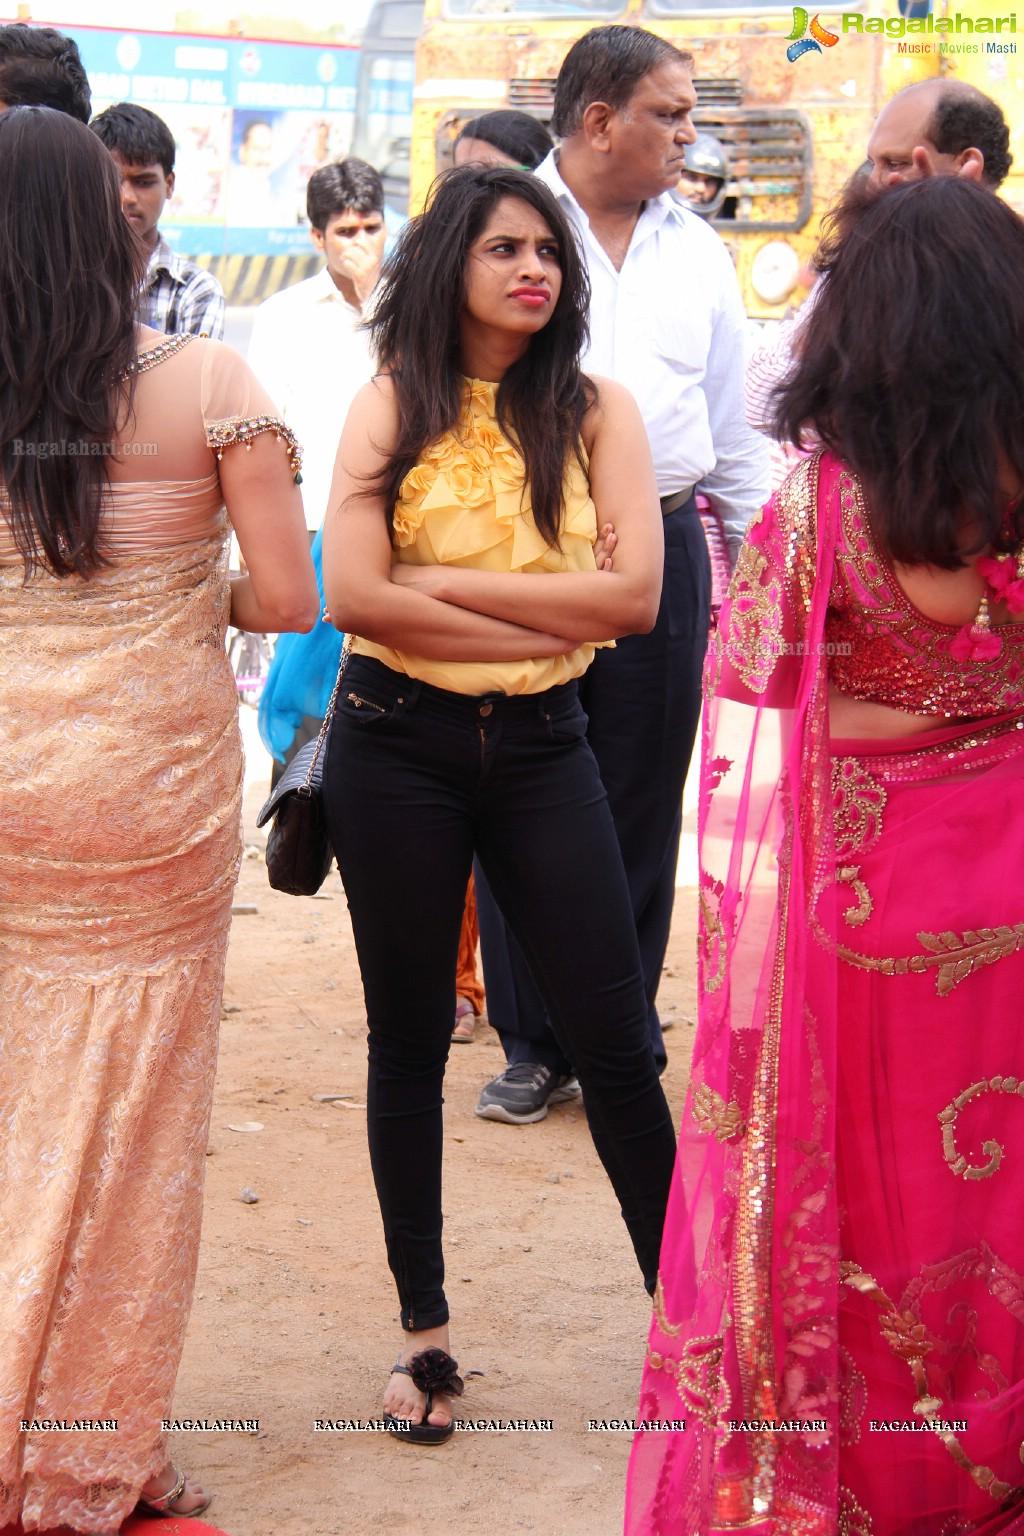 ExCBI JD Lakshmi Narayana  Open Heart with RK  Full Episode  ABN Telugu